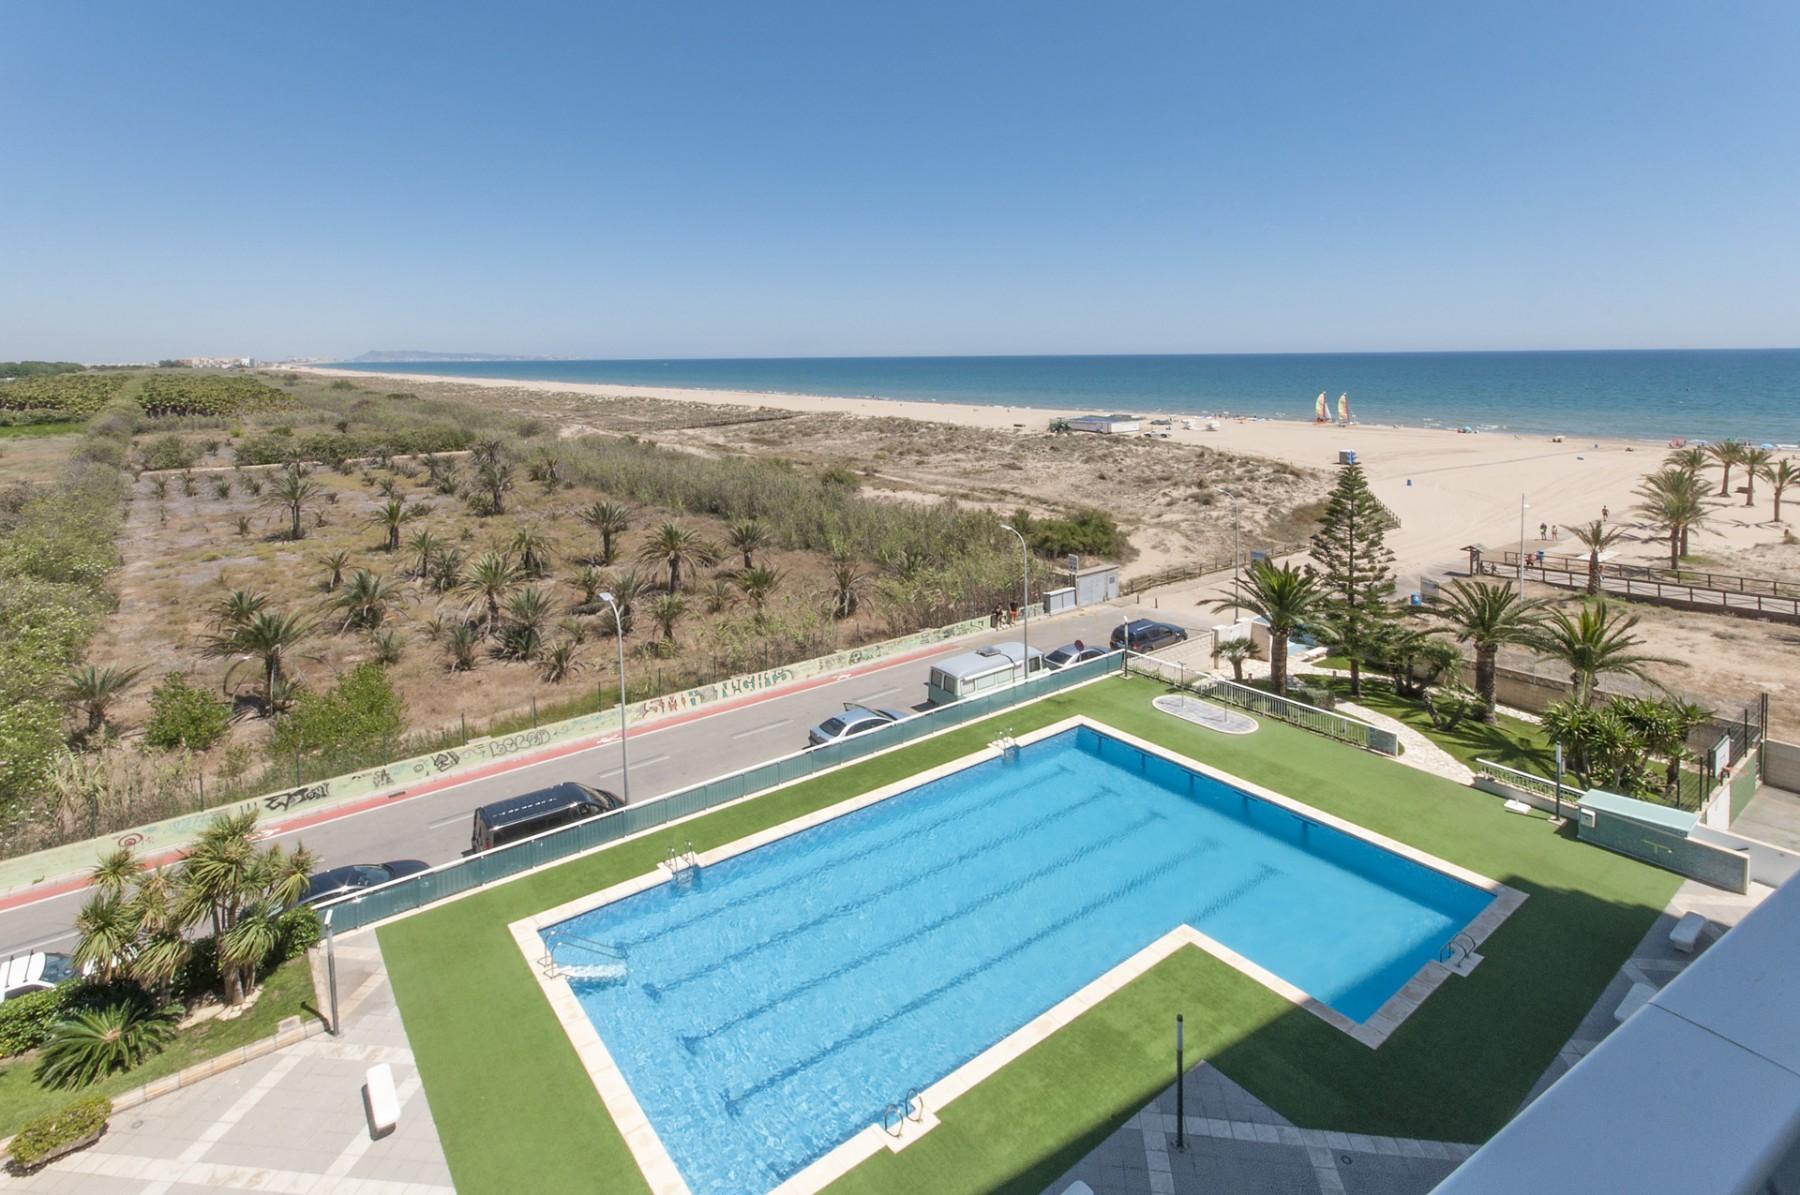 Apartamentos playa de gandia alquiler de apartamentos en - Apartamentos baratos vacaciones playa ...